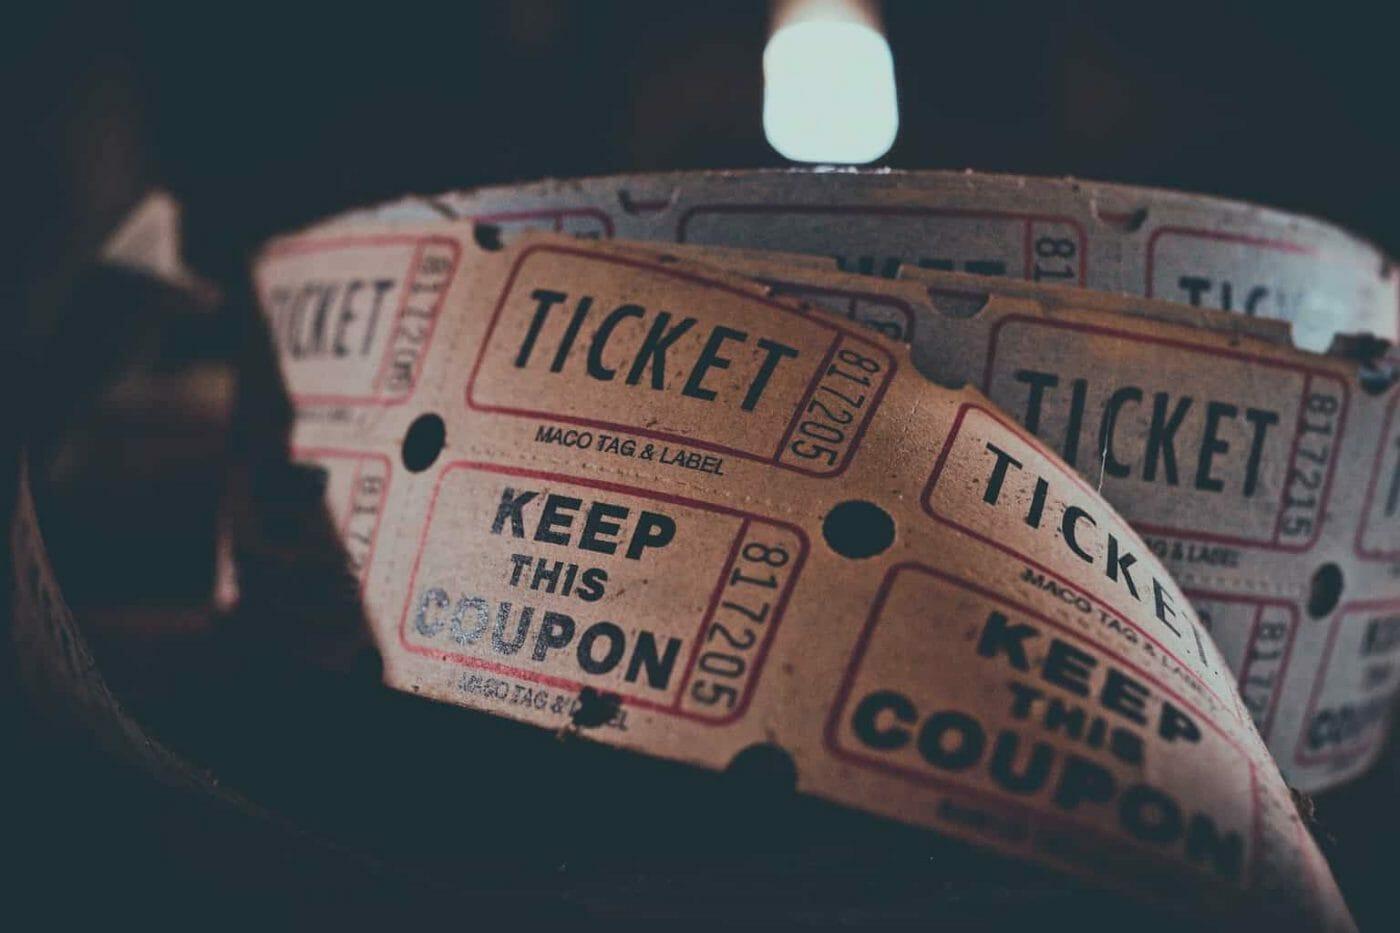 Paper admission ticket